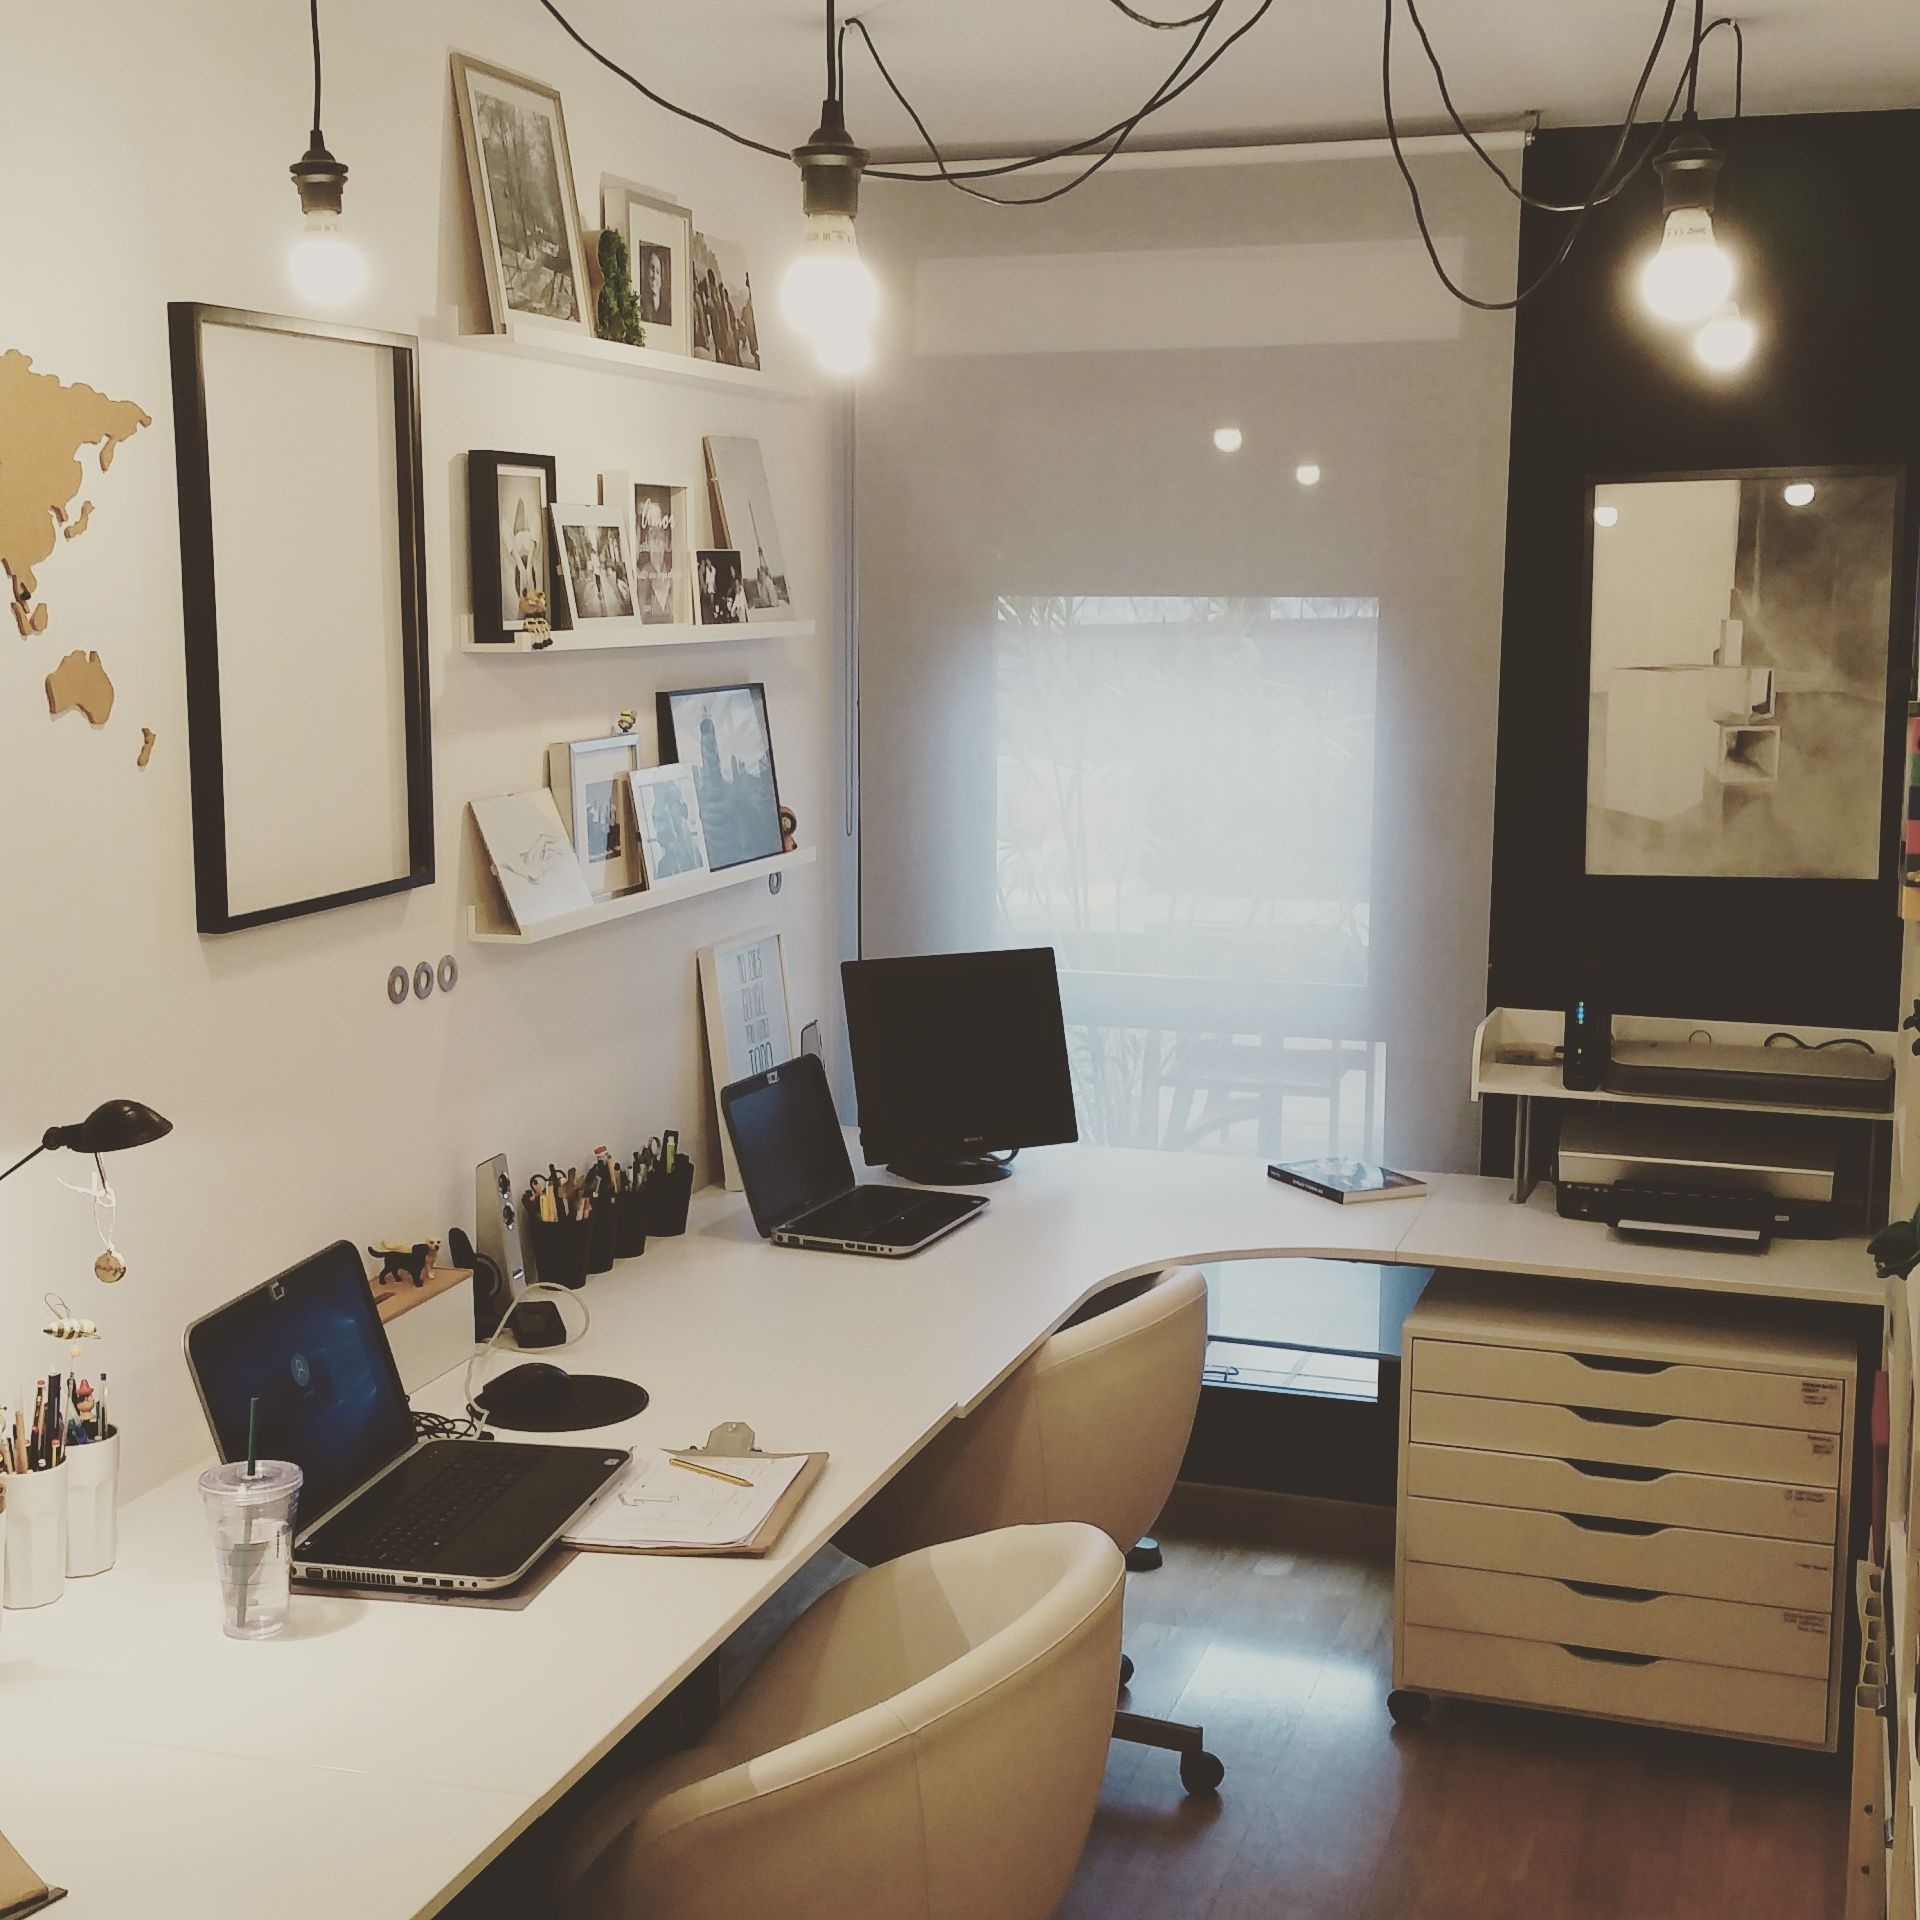 Despacho en casa workplace at home mi casa homepersonalshopper despacho pinterest - Despachos de diseno ...